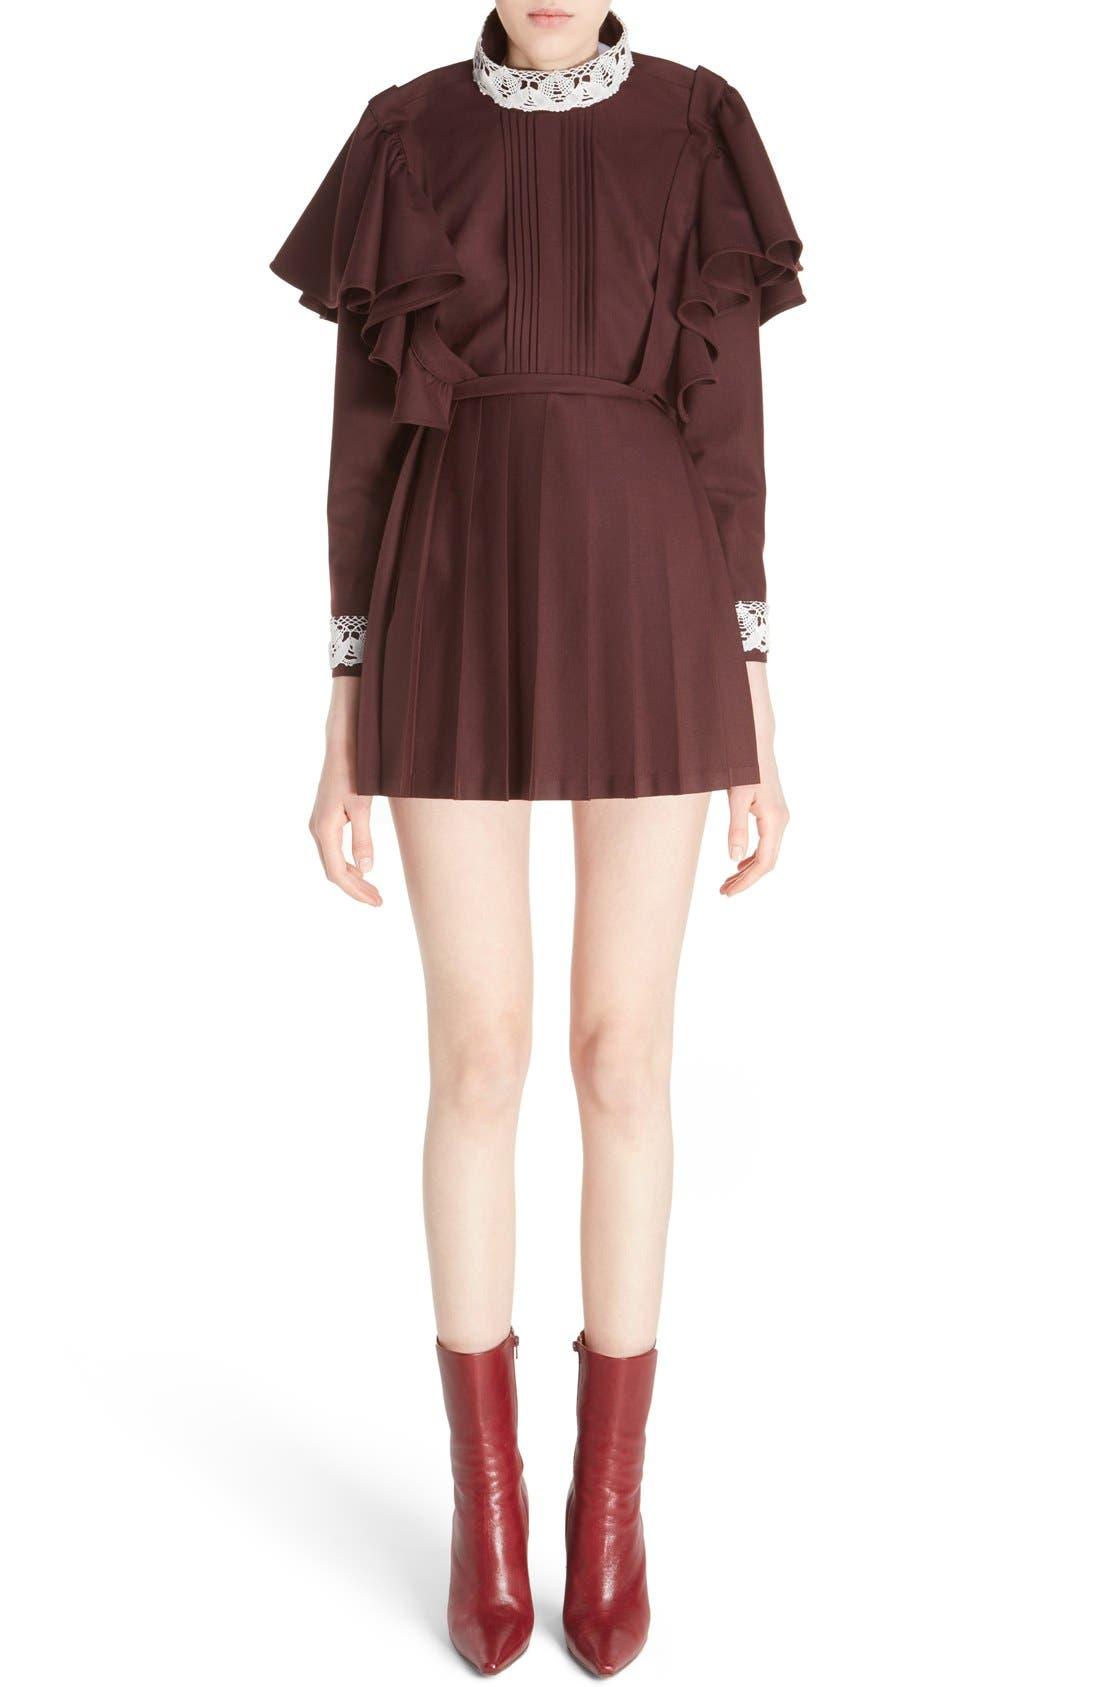 Main Image - Vetements 'Schoolgirl' Lace Trim Minidress